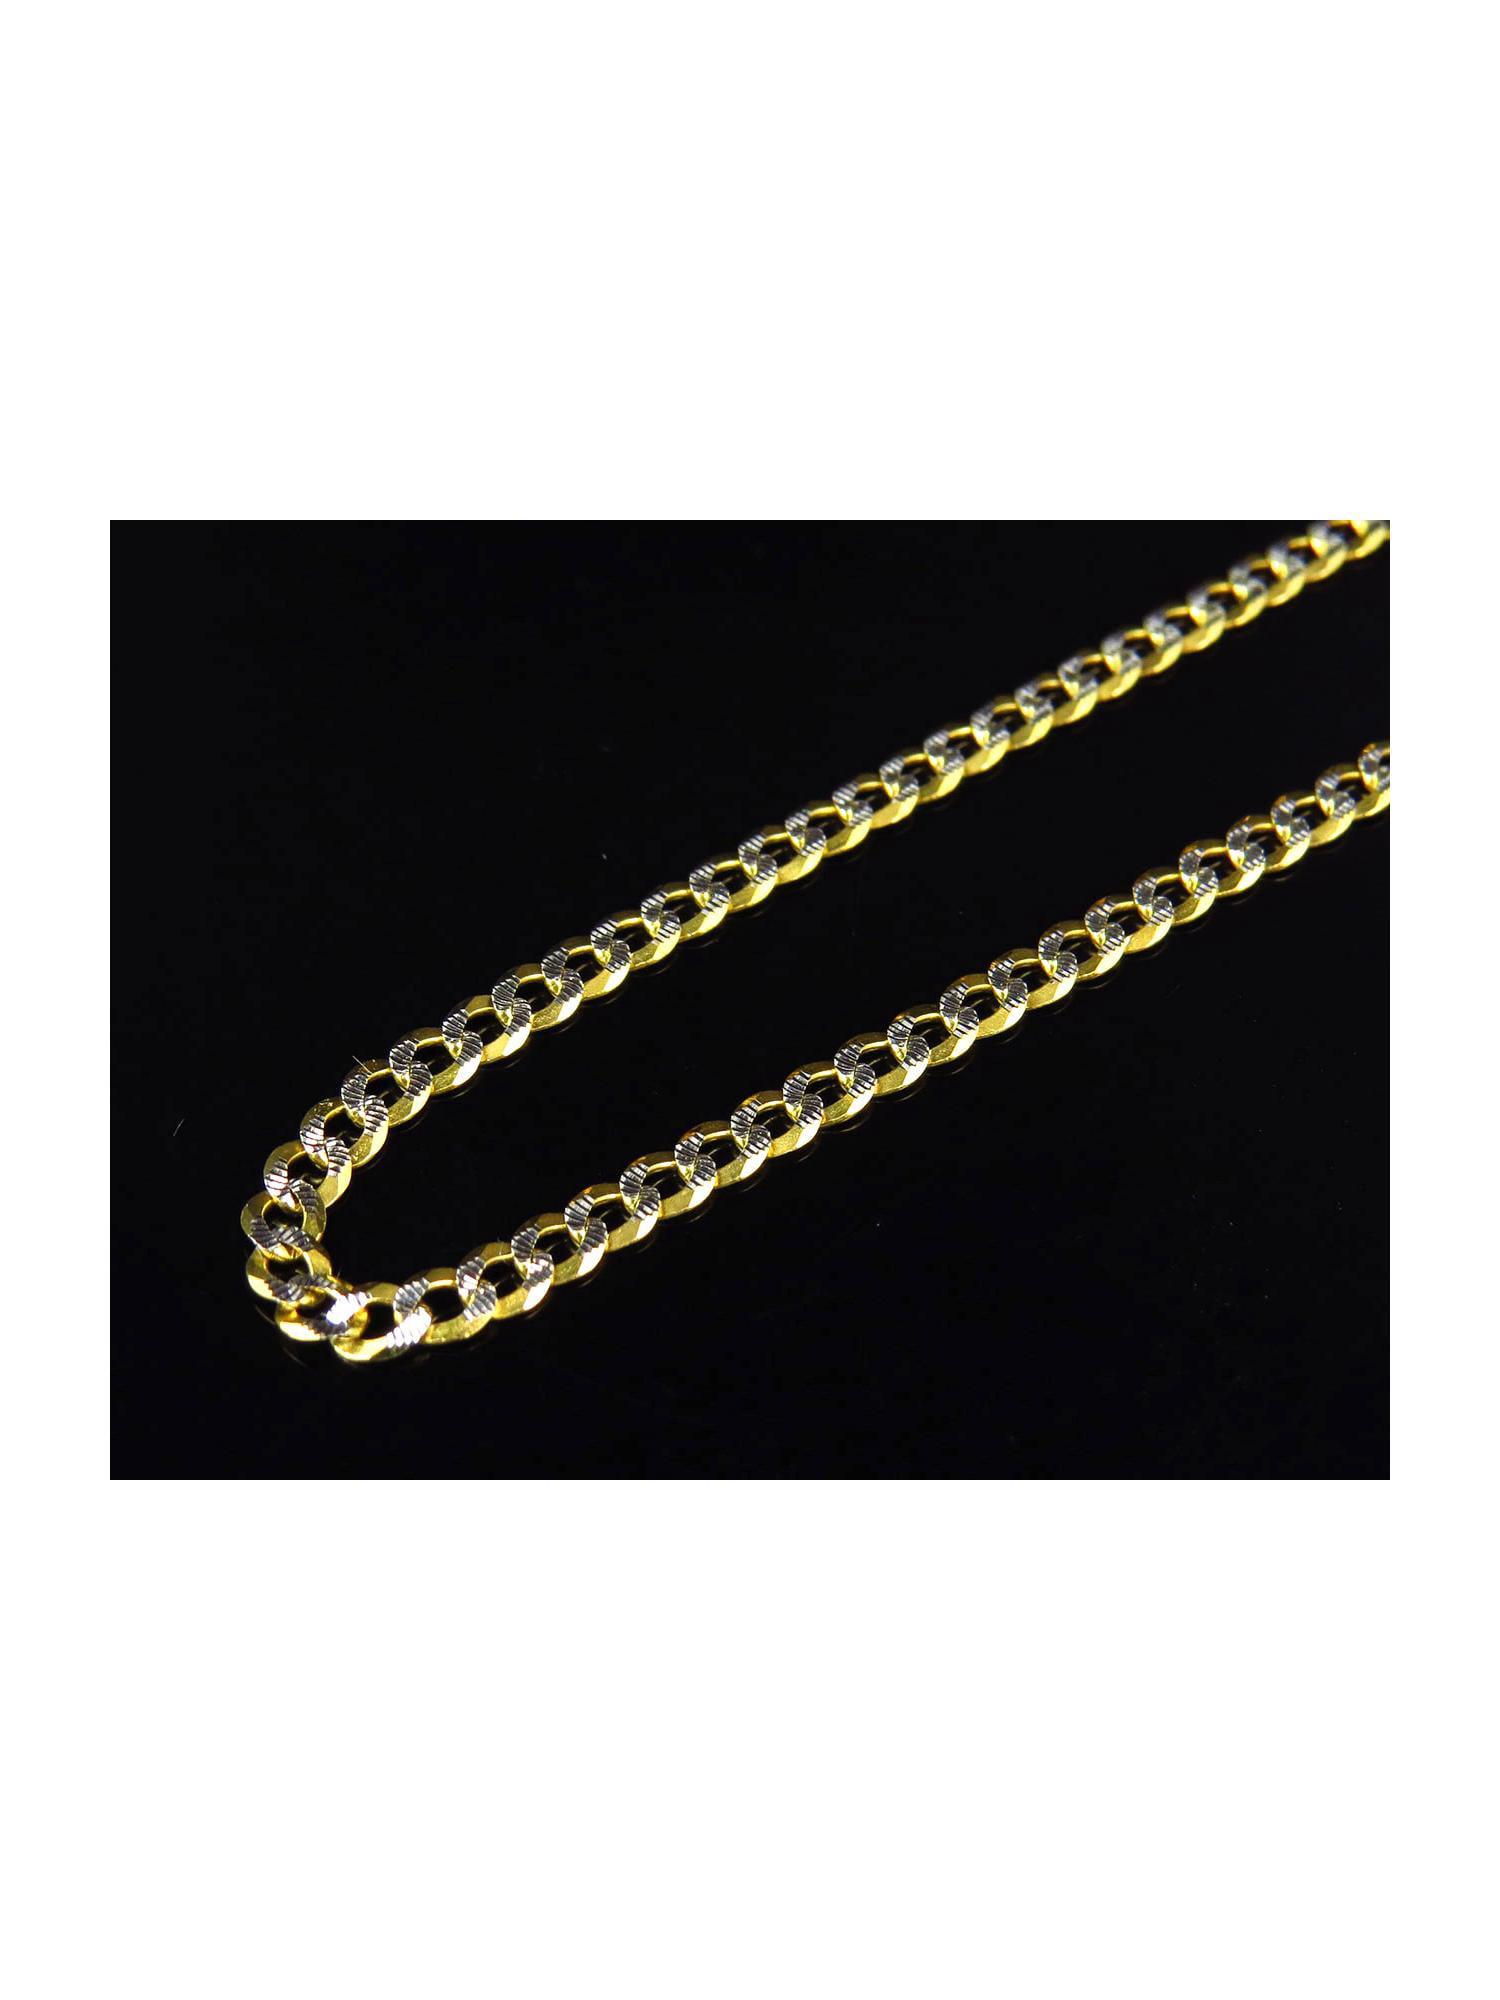 GWOOD Black Girls Rock 18 Inch Link Style Necklace Medium Gold Color